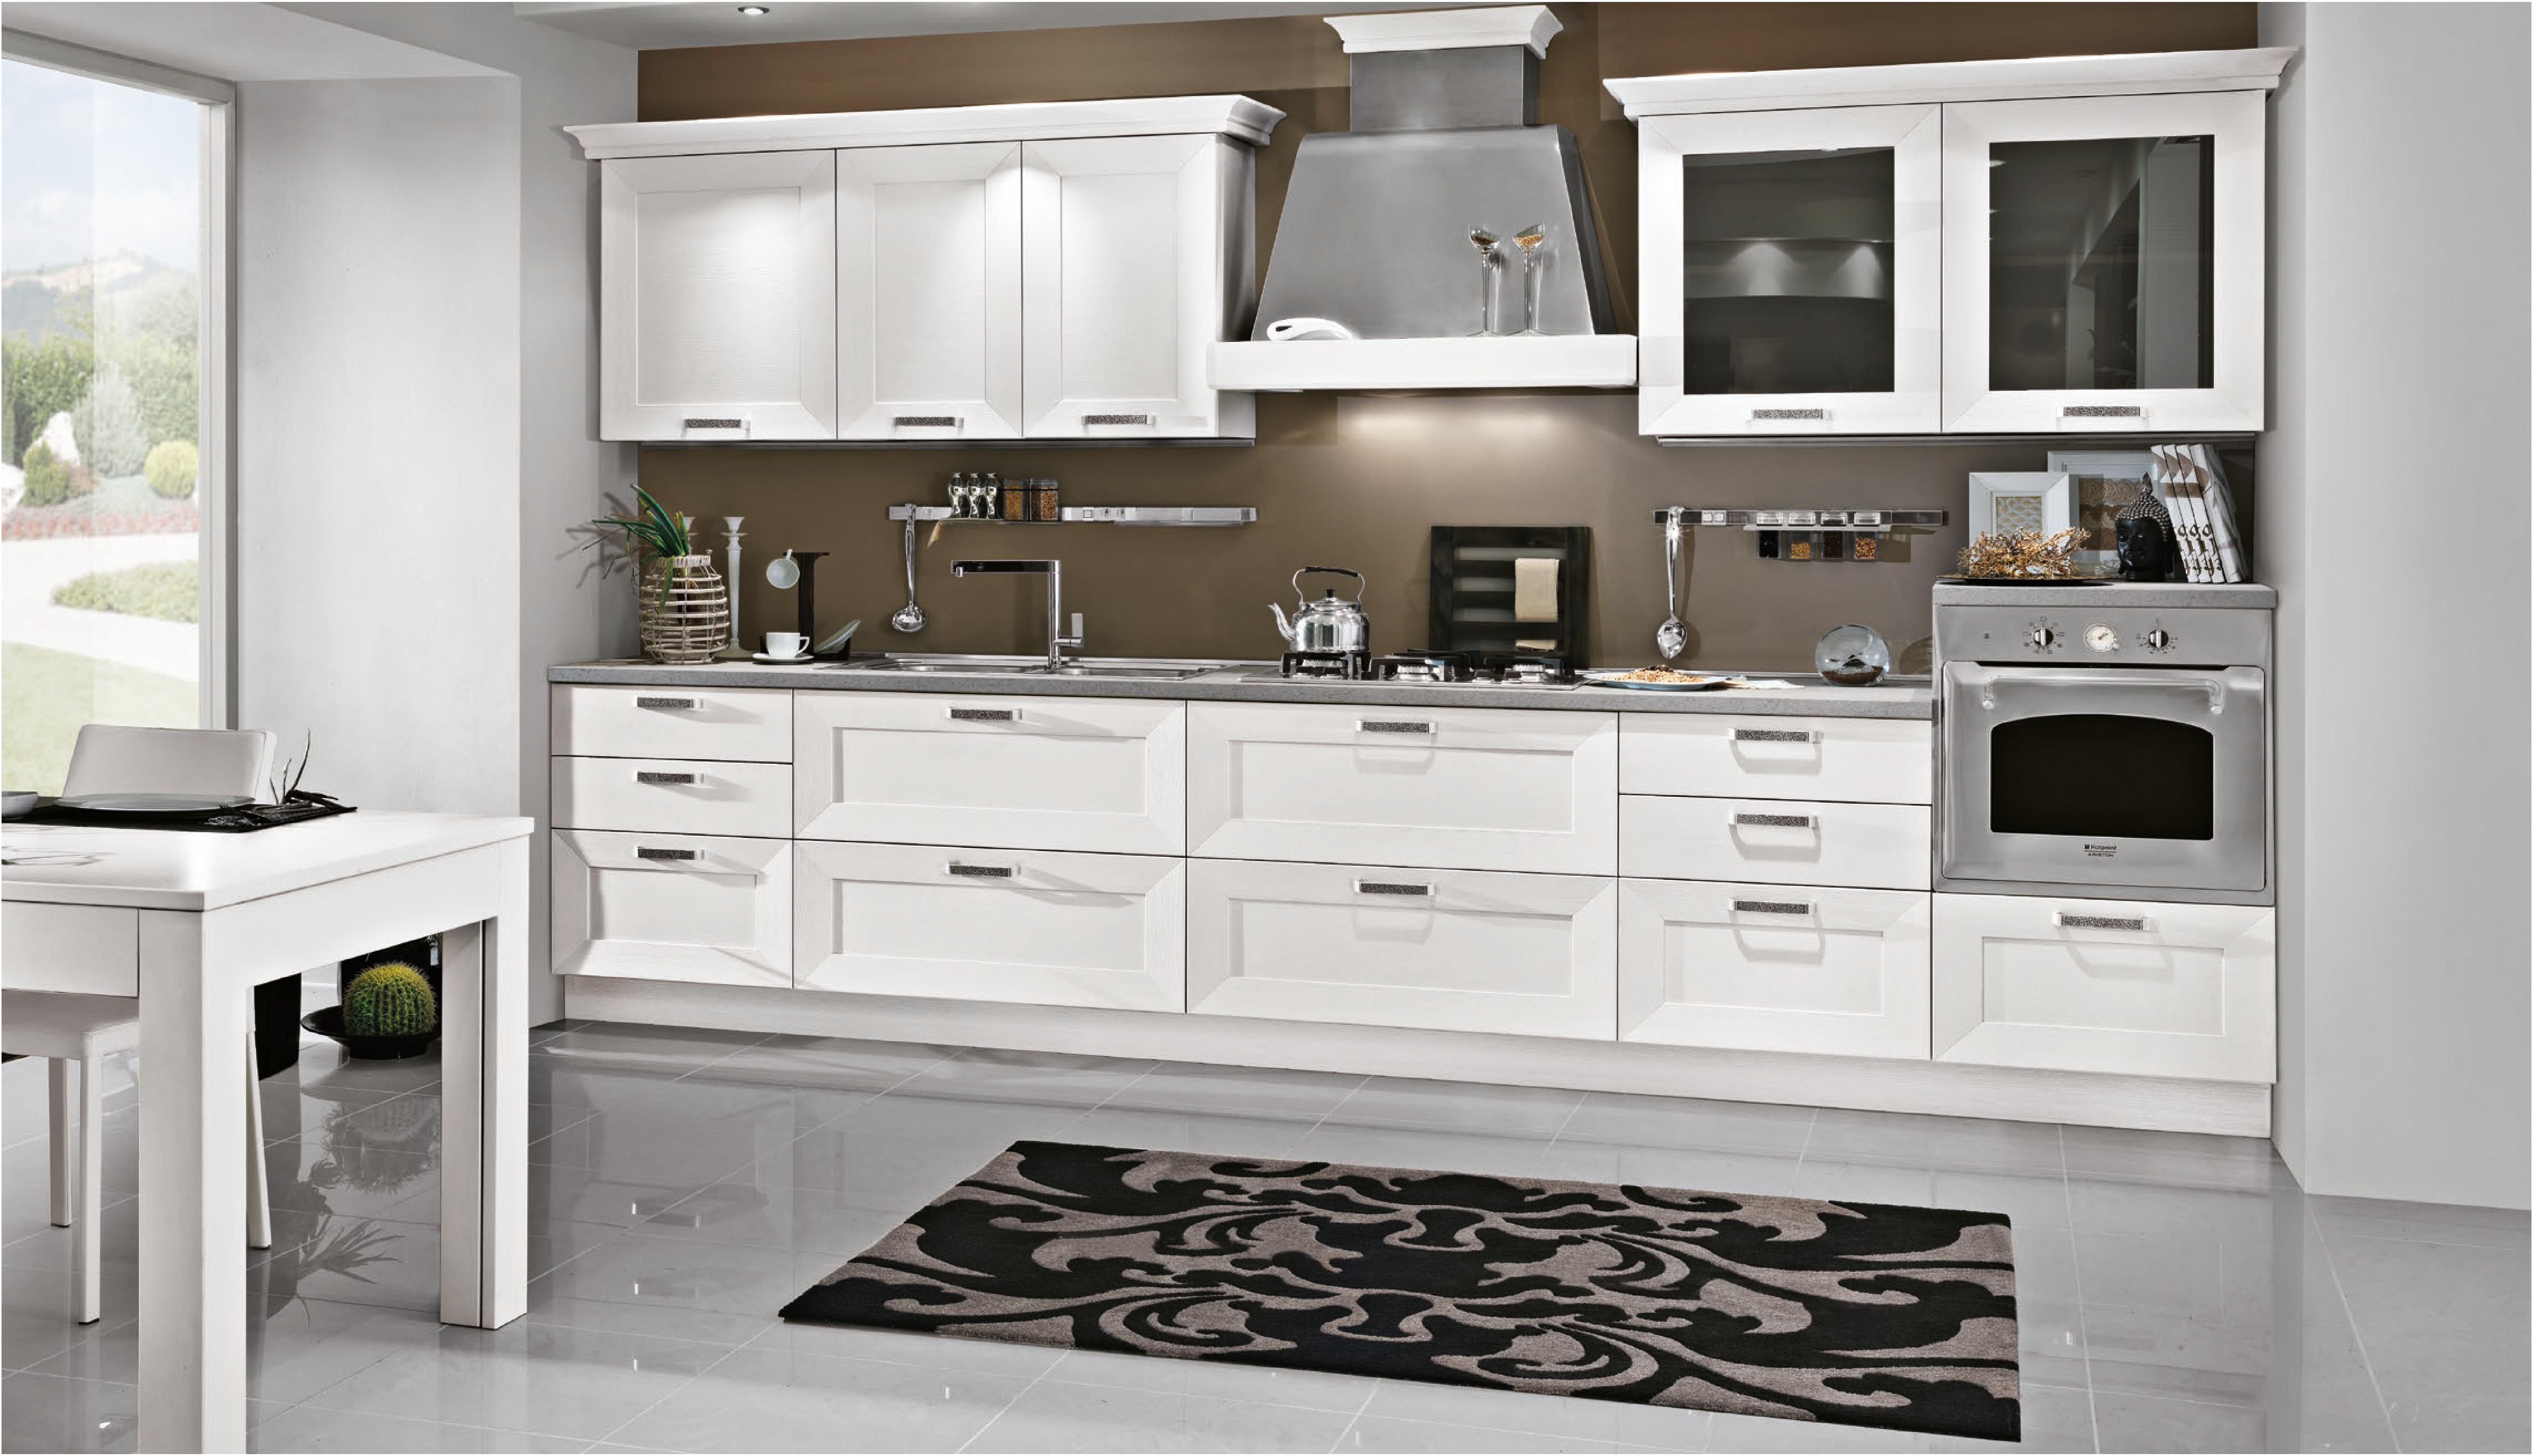 Cucine Moderne Bianco.Celine Bianco Spazio Arreda Harte Realizza L